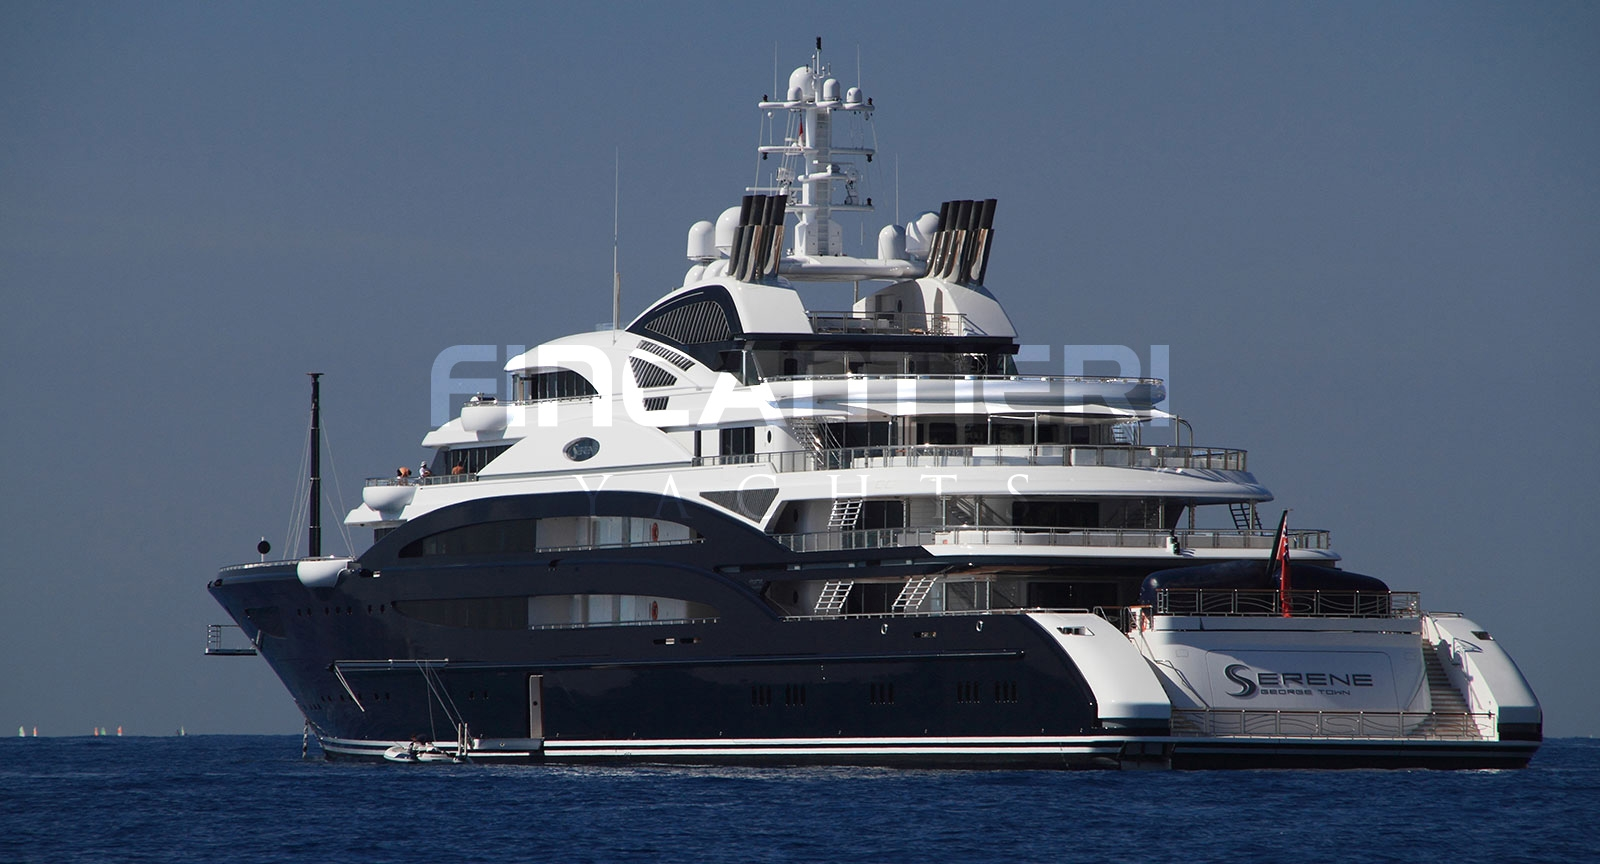 Yacht SERENE - Aft Profile